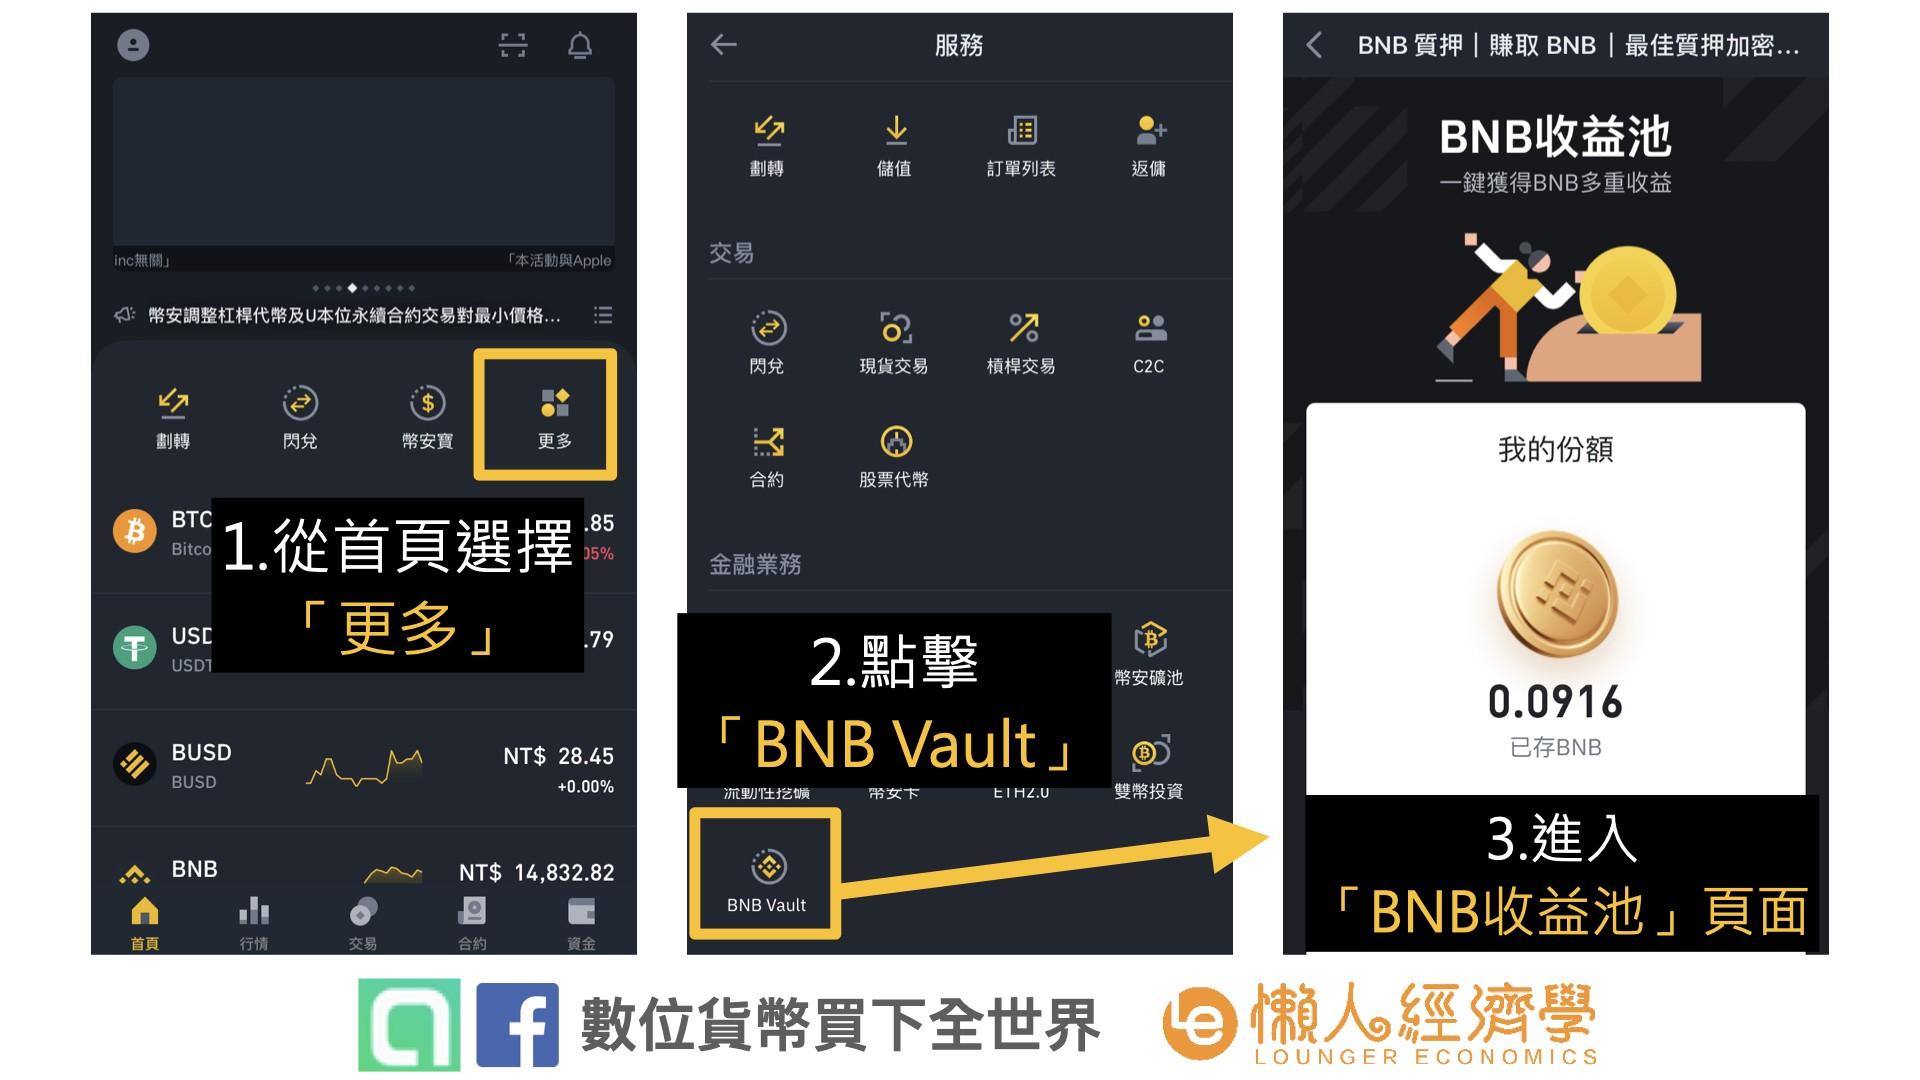 BNB收益池操作教學:進入手機版BNB收益池步驟